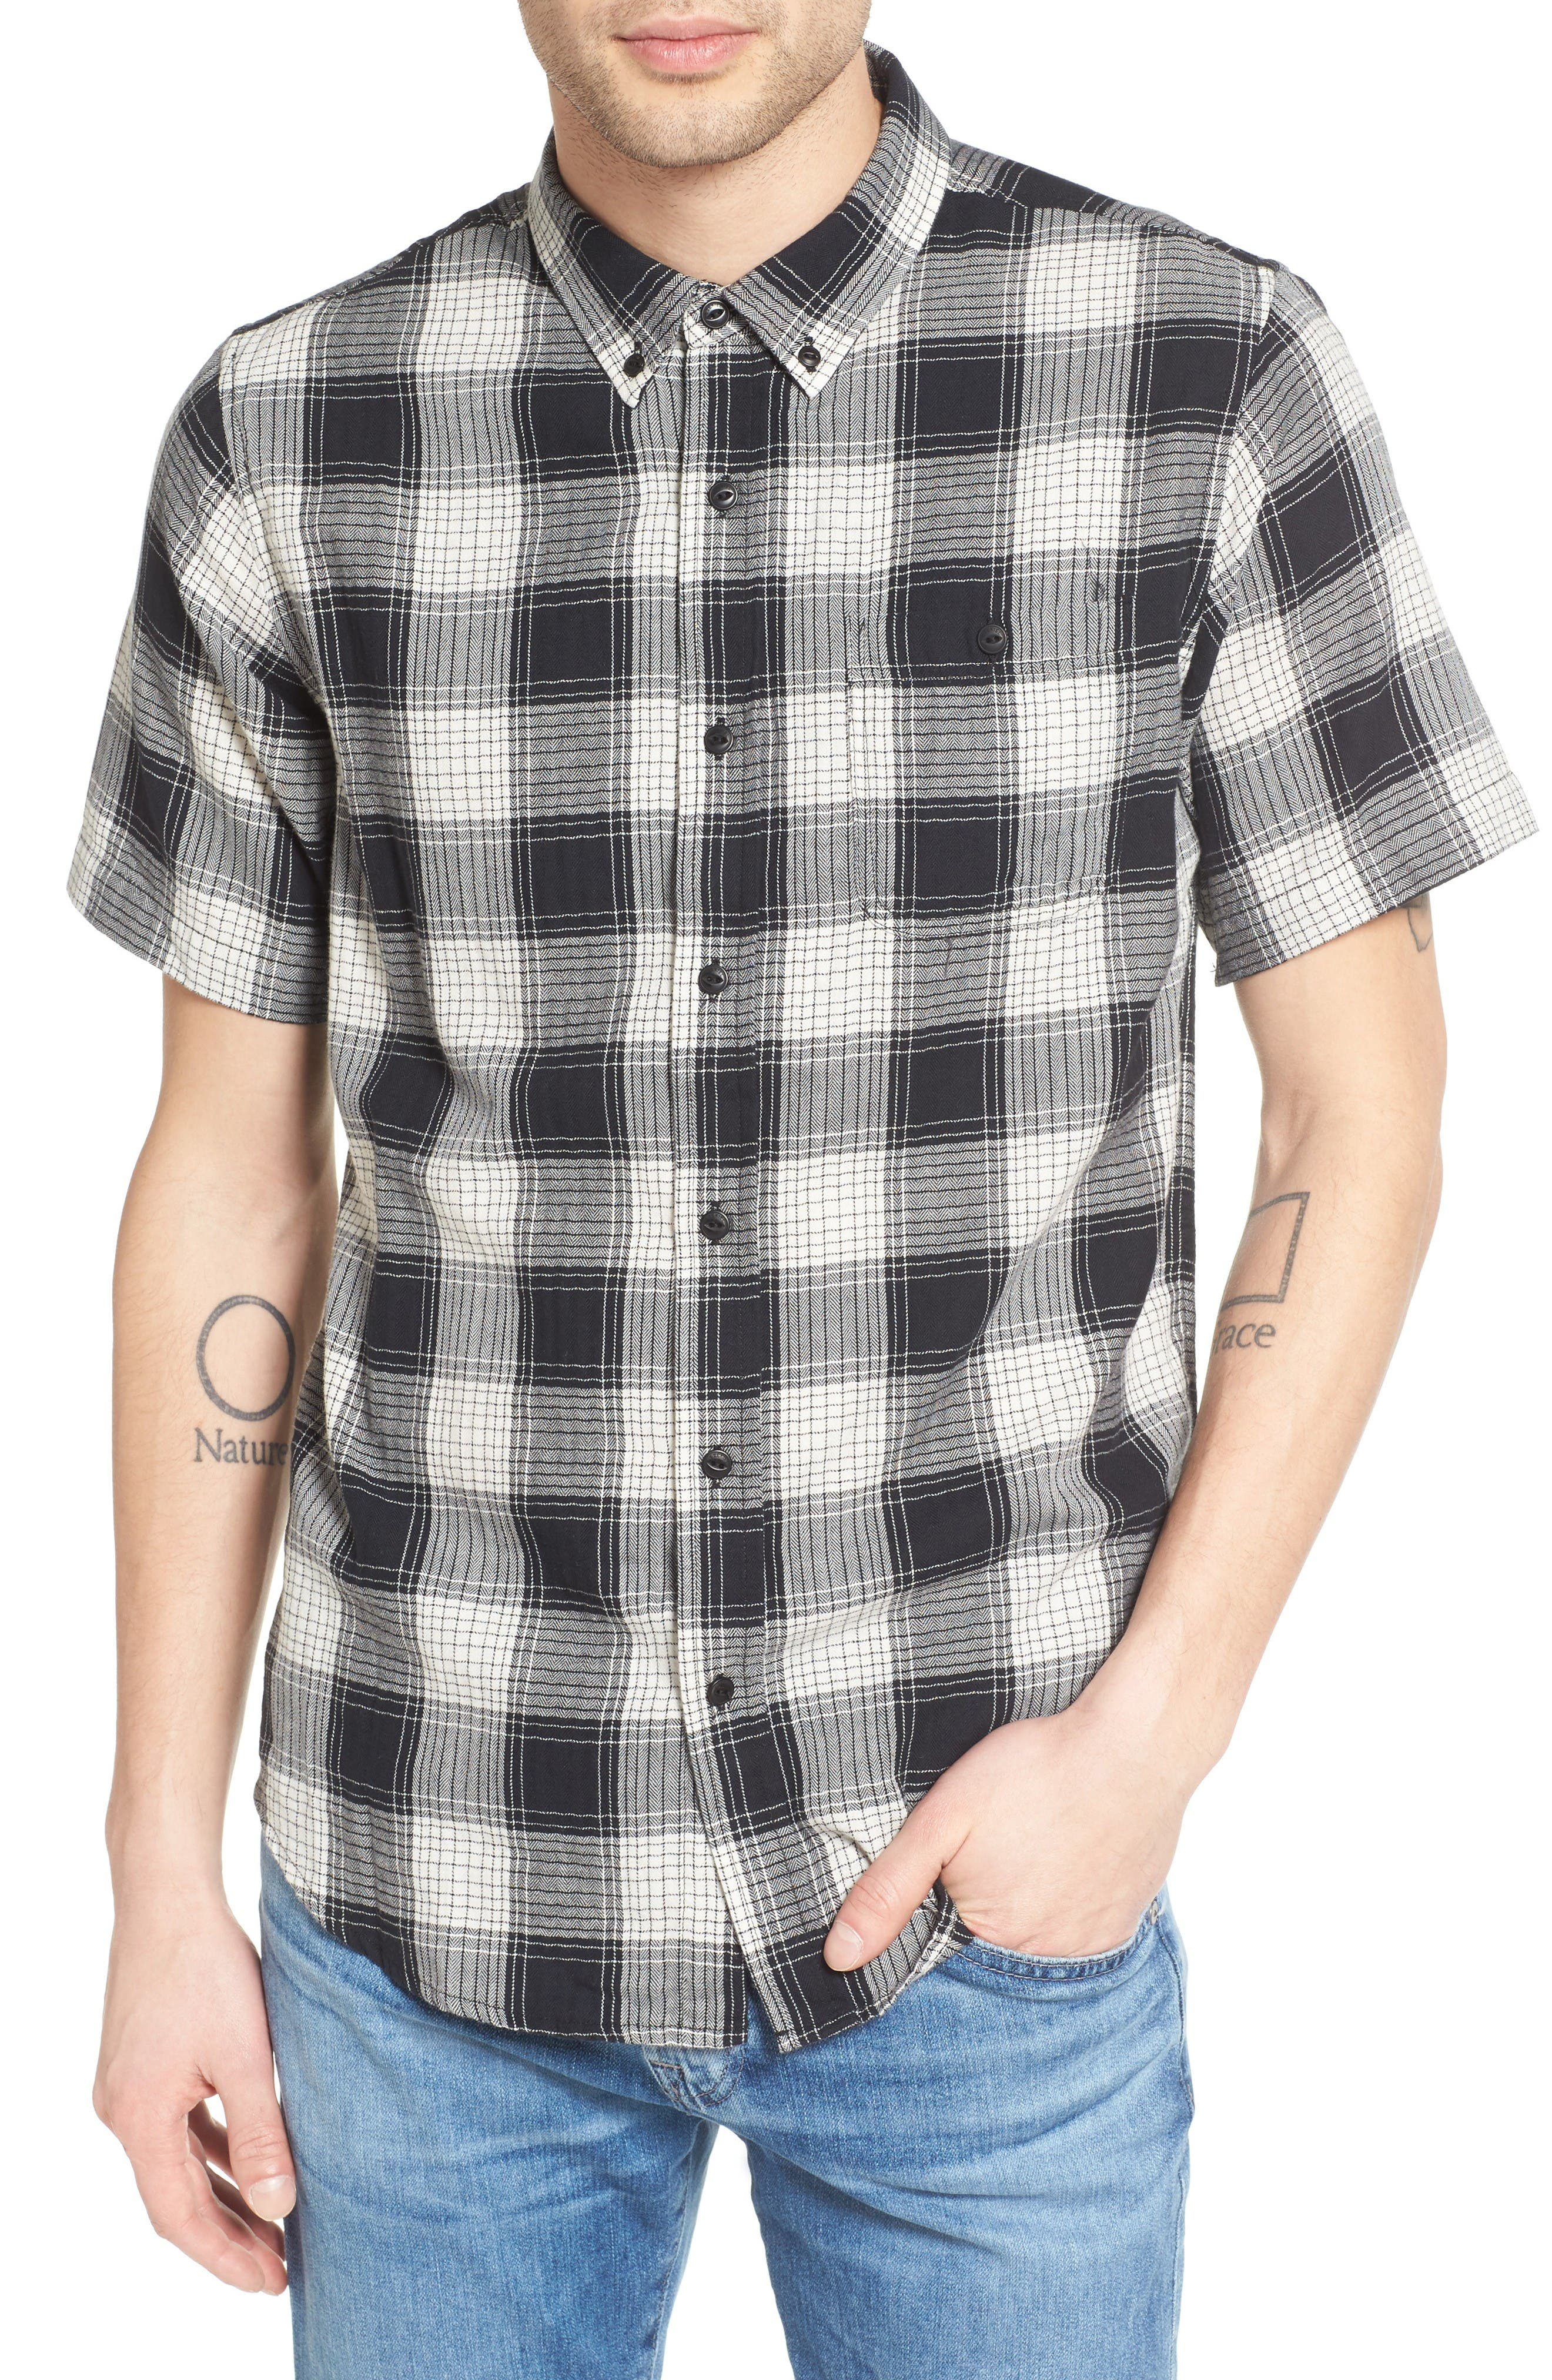 Ezekiel Herringbone Woven Plaid Shirt